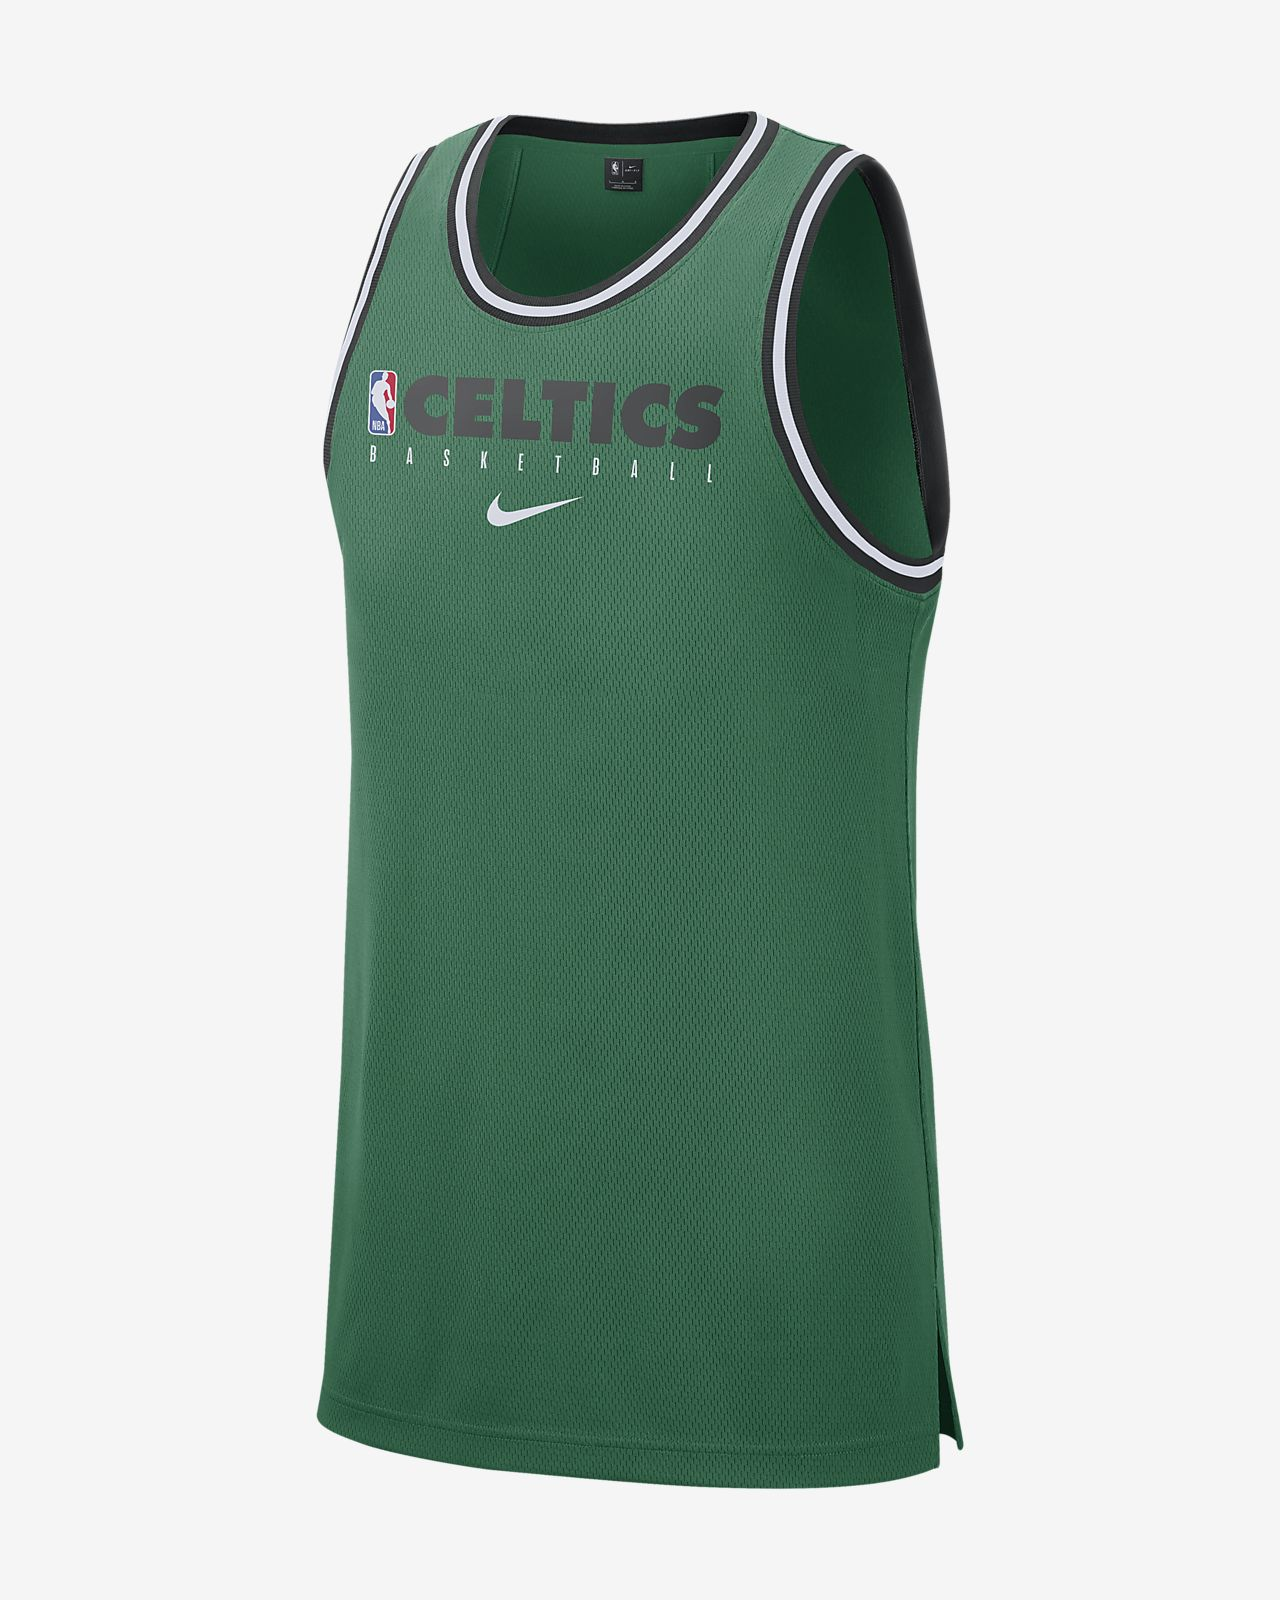 Męska koszulka bez rękawów NBA Boston Celtics Nike Dri-FIT